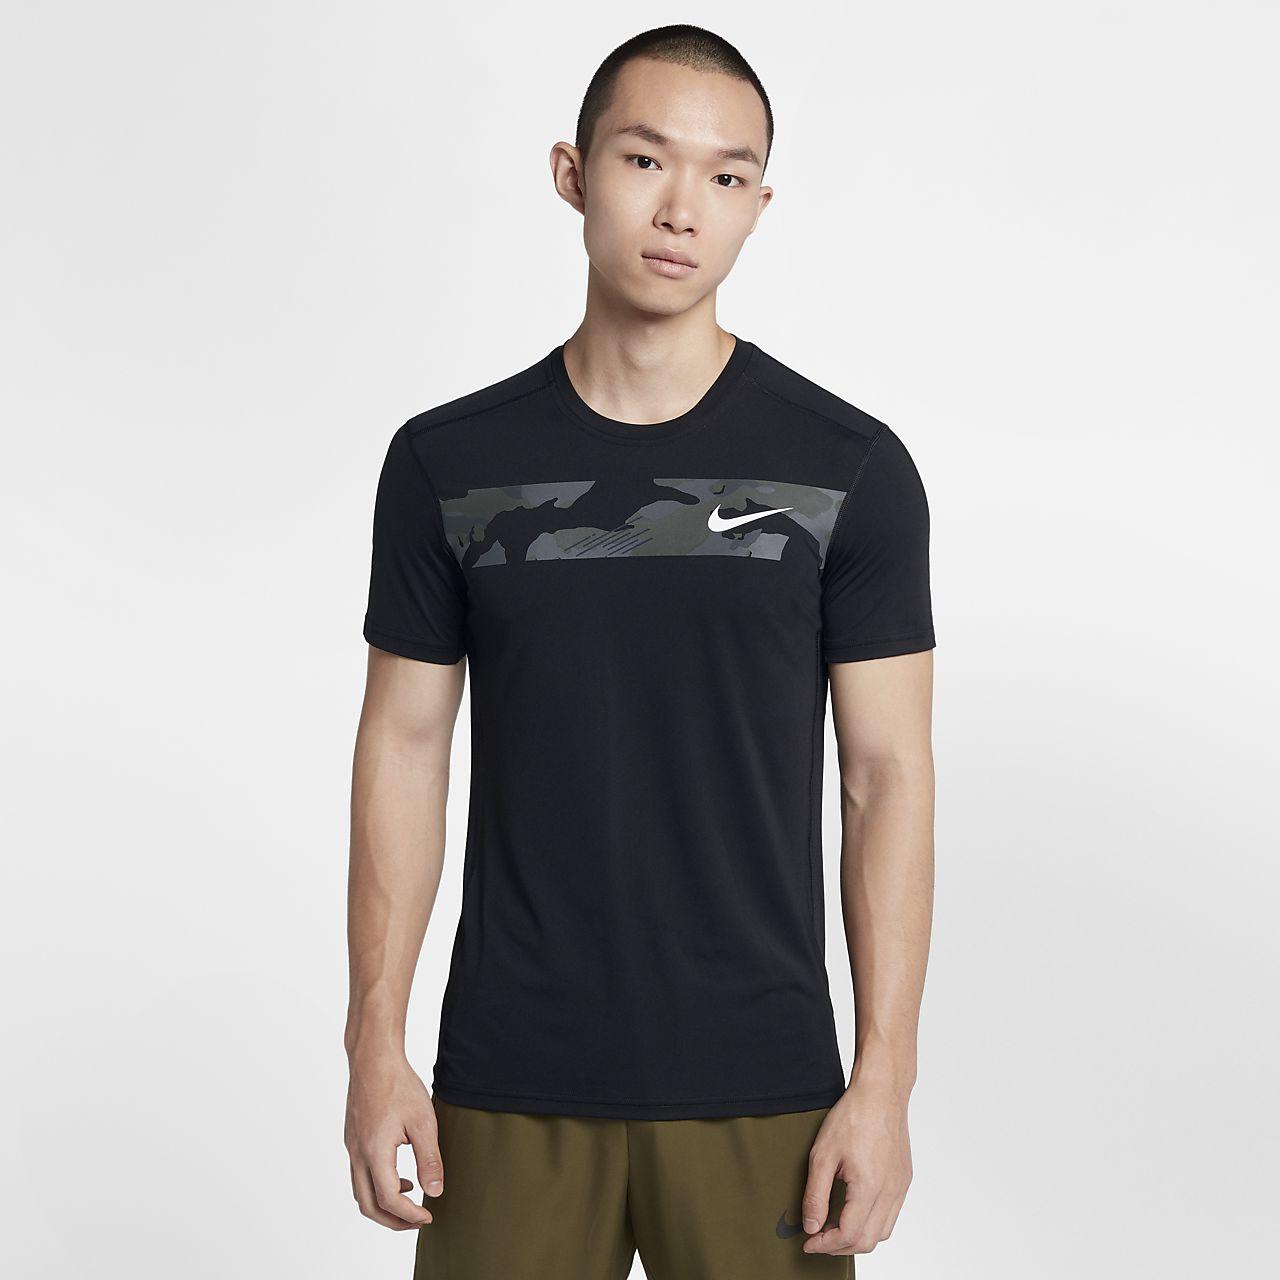 Nike Men's Short-Sleeve Camo Training Top